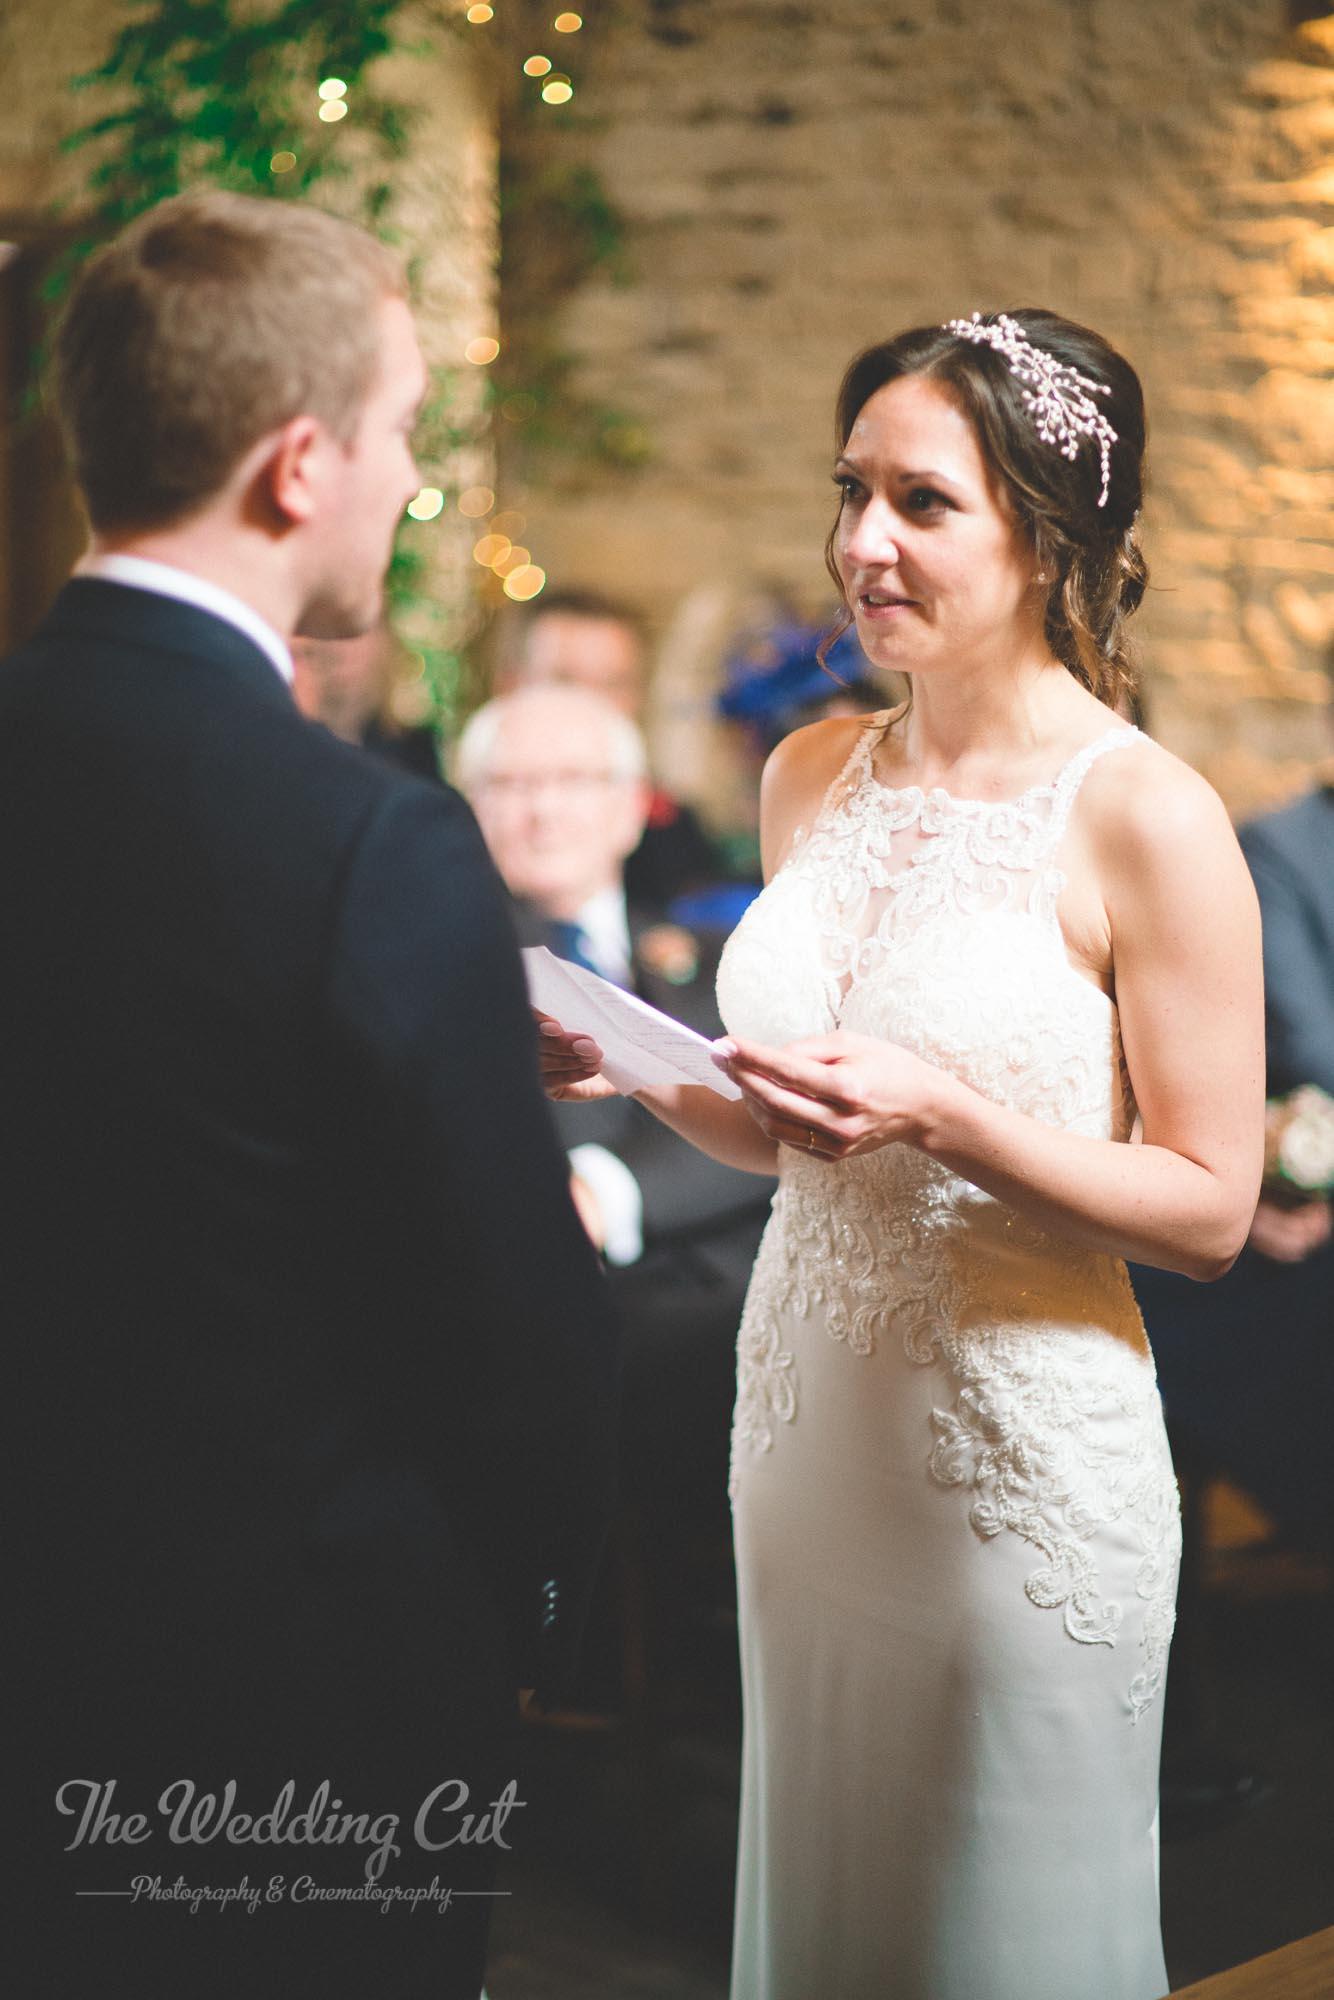 Rebecca and Rick, Cripps Barn Winter Wedding-11.jpg